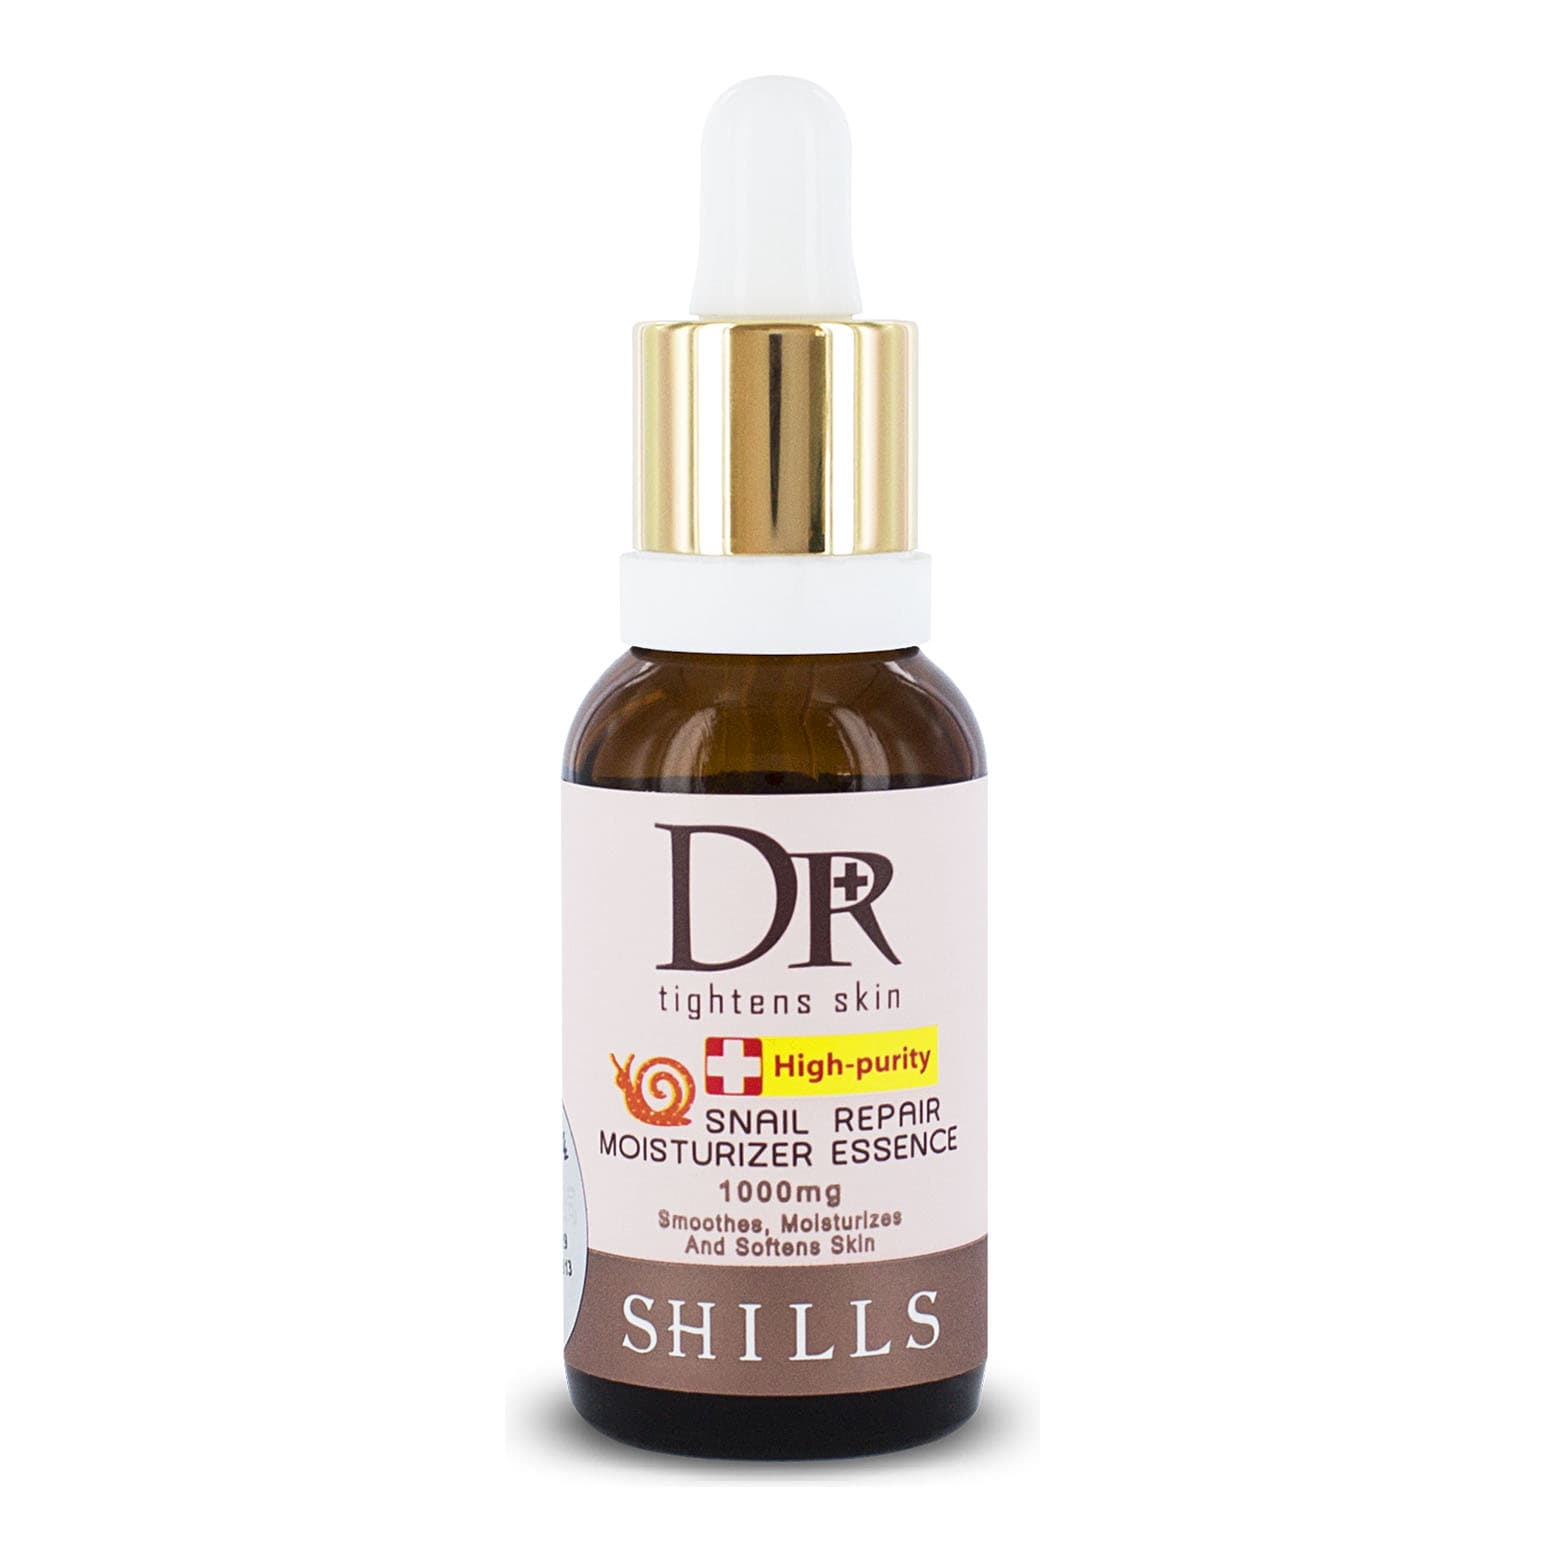 Snail Repair Moisturiser Essence 30ml Shills Uk Secretion Filtrate Moisture Facial Cream 30 Ml